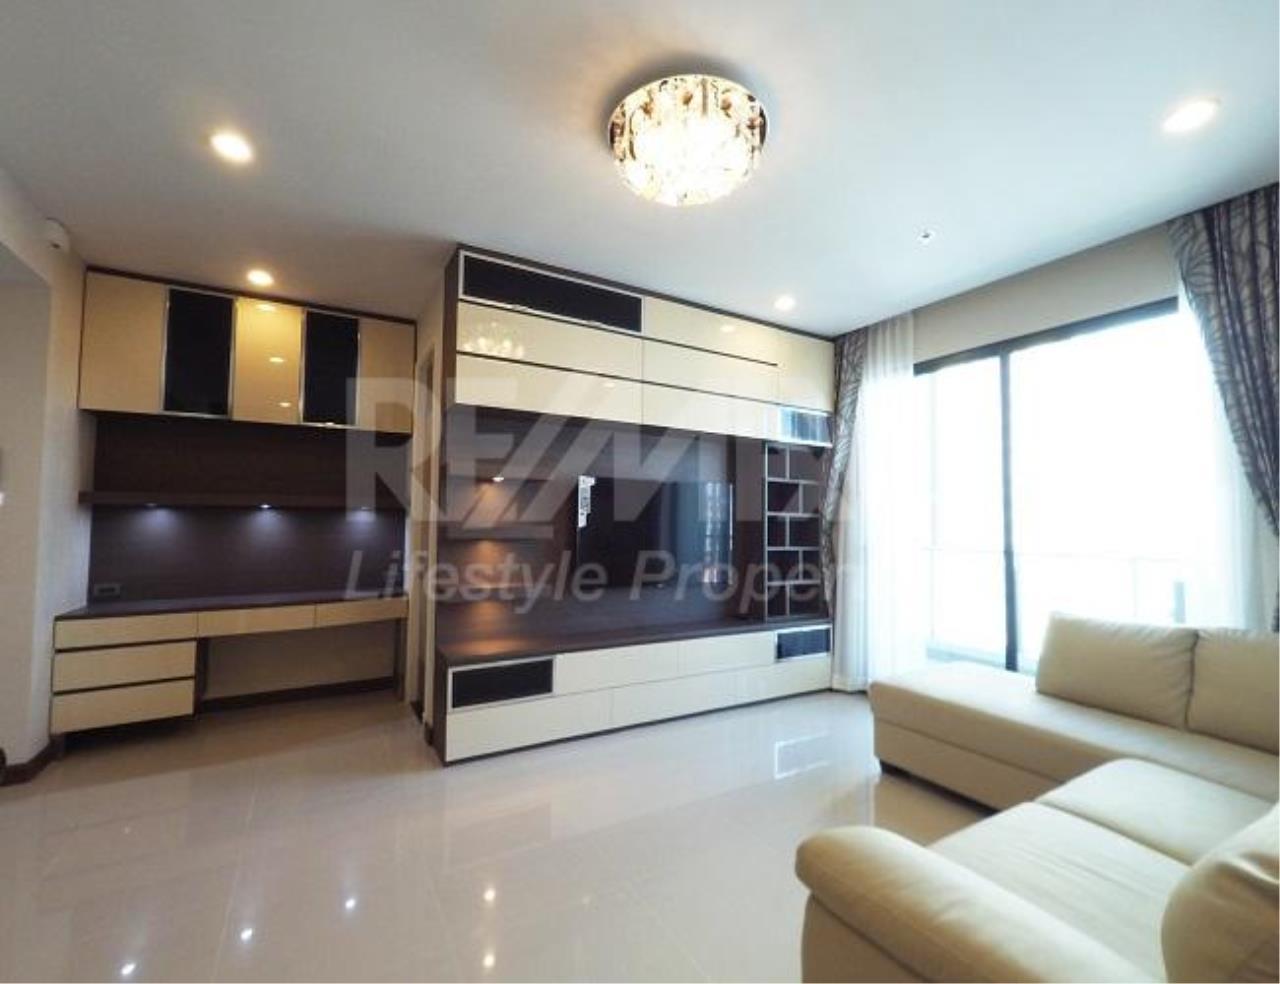 RE/MAX LifeStyle Property Agency's Supalai Premier @ Asoke 12